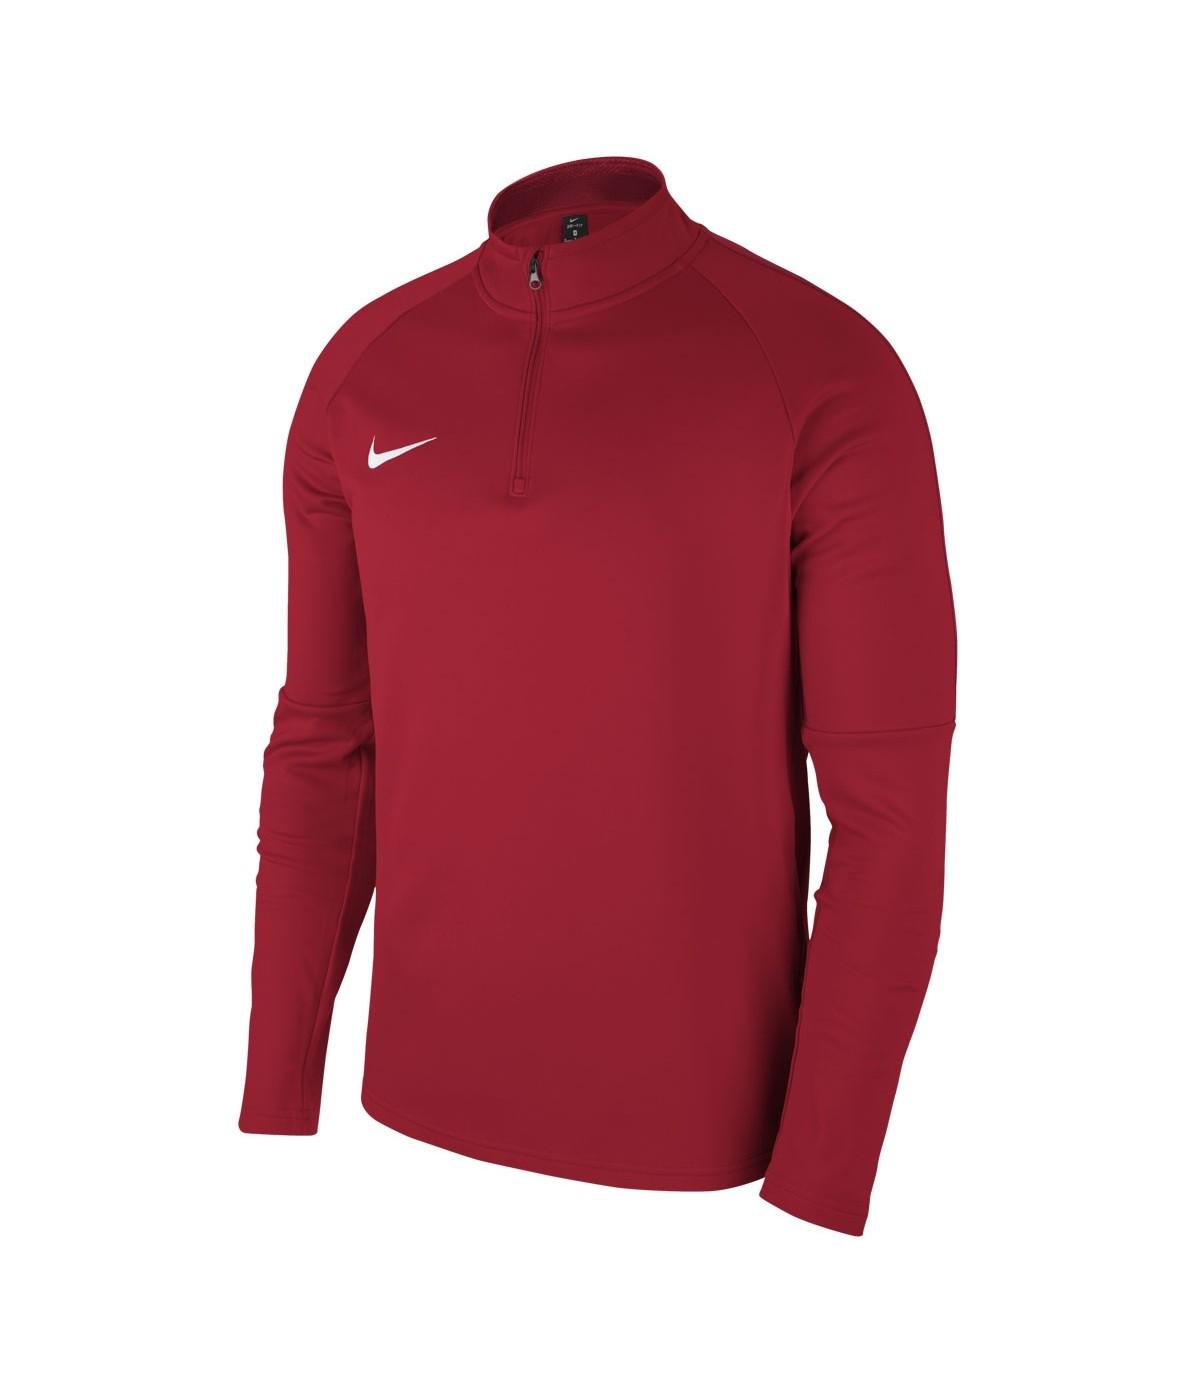 e44d66e21 Nike Academy 18 Midlayer - Johnstown Football Club